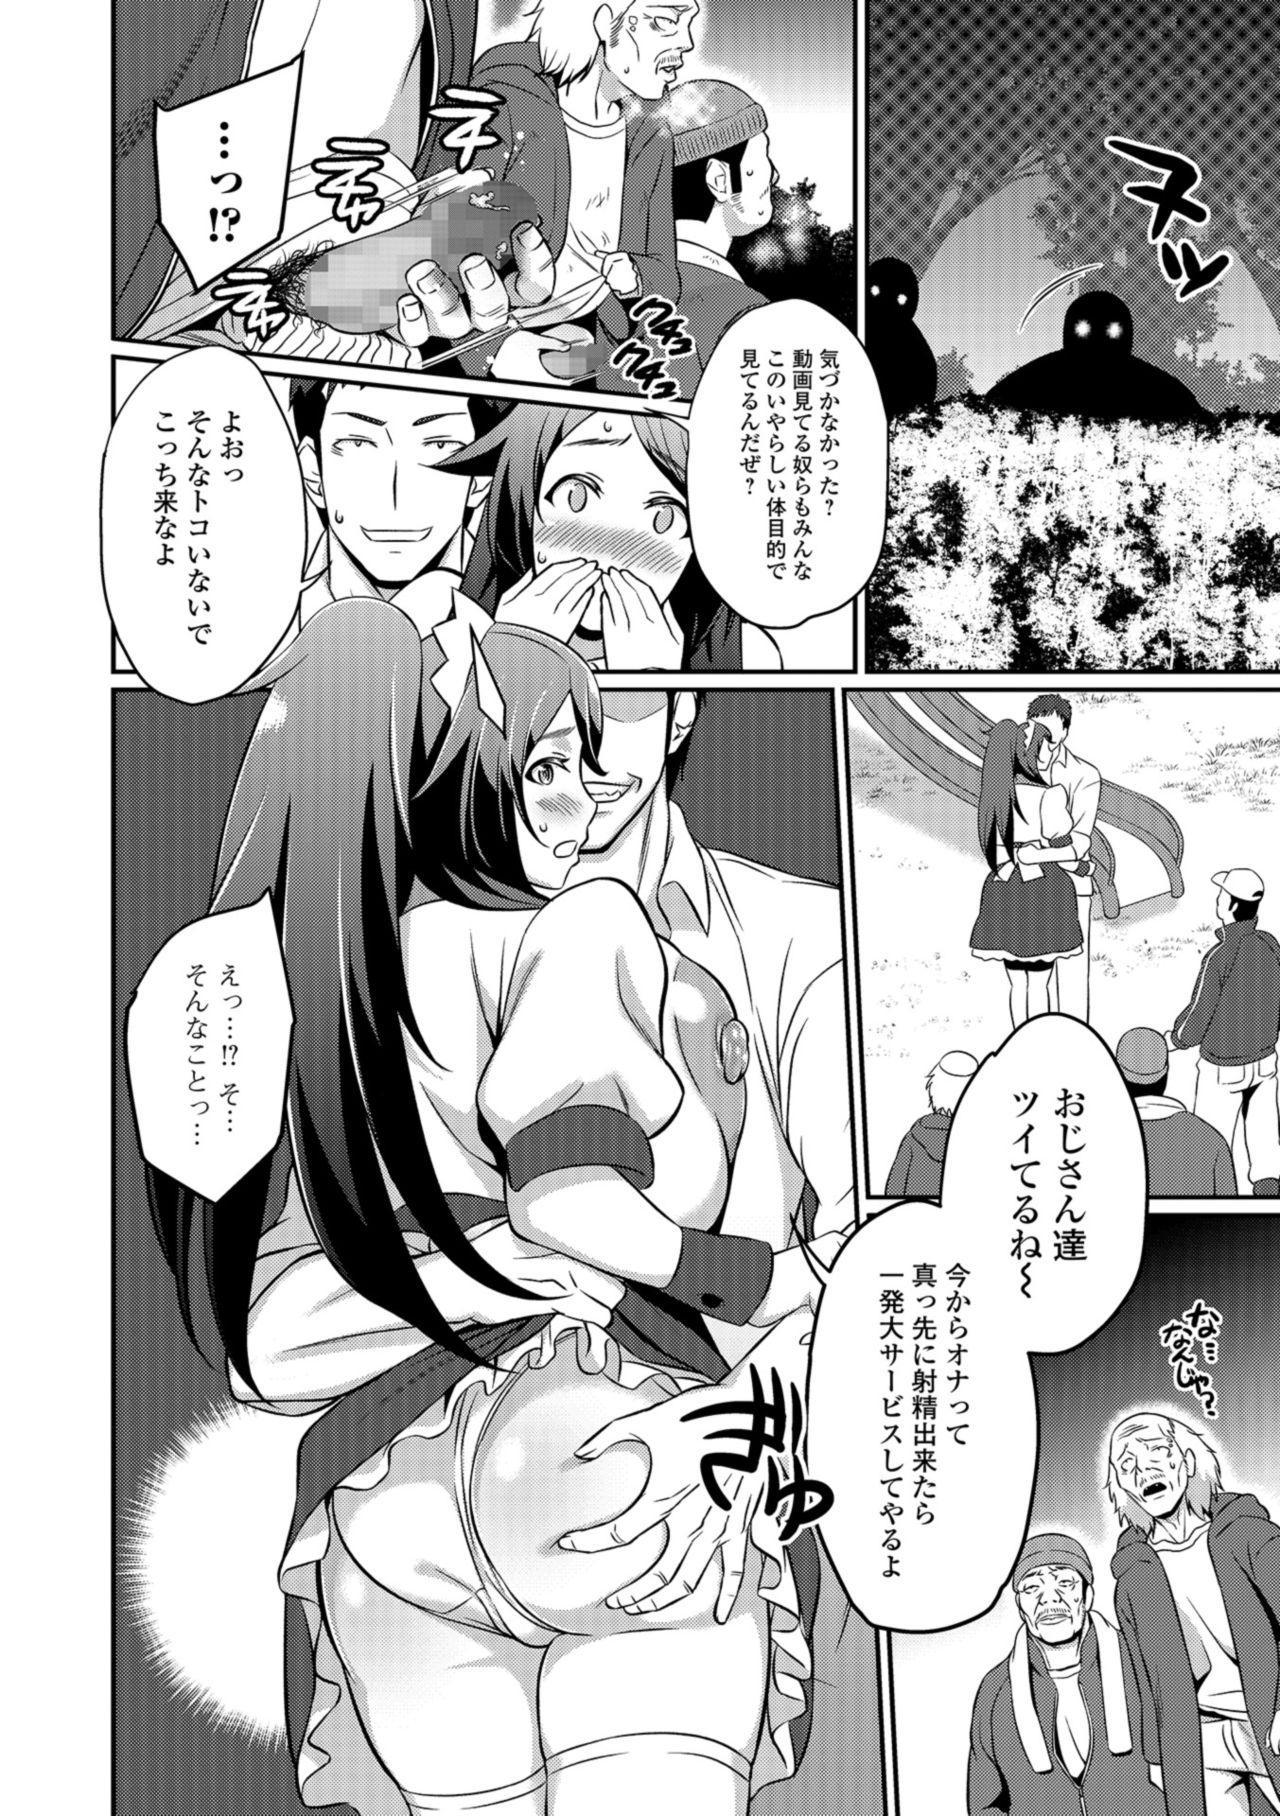 COMIC Shigekiteki SQUIRT!! Vol. 09 229